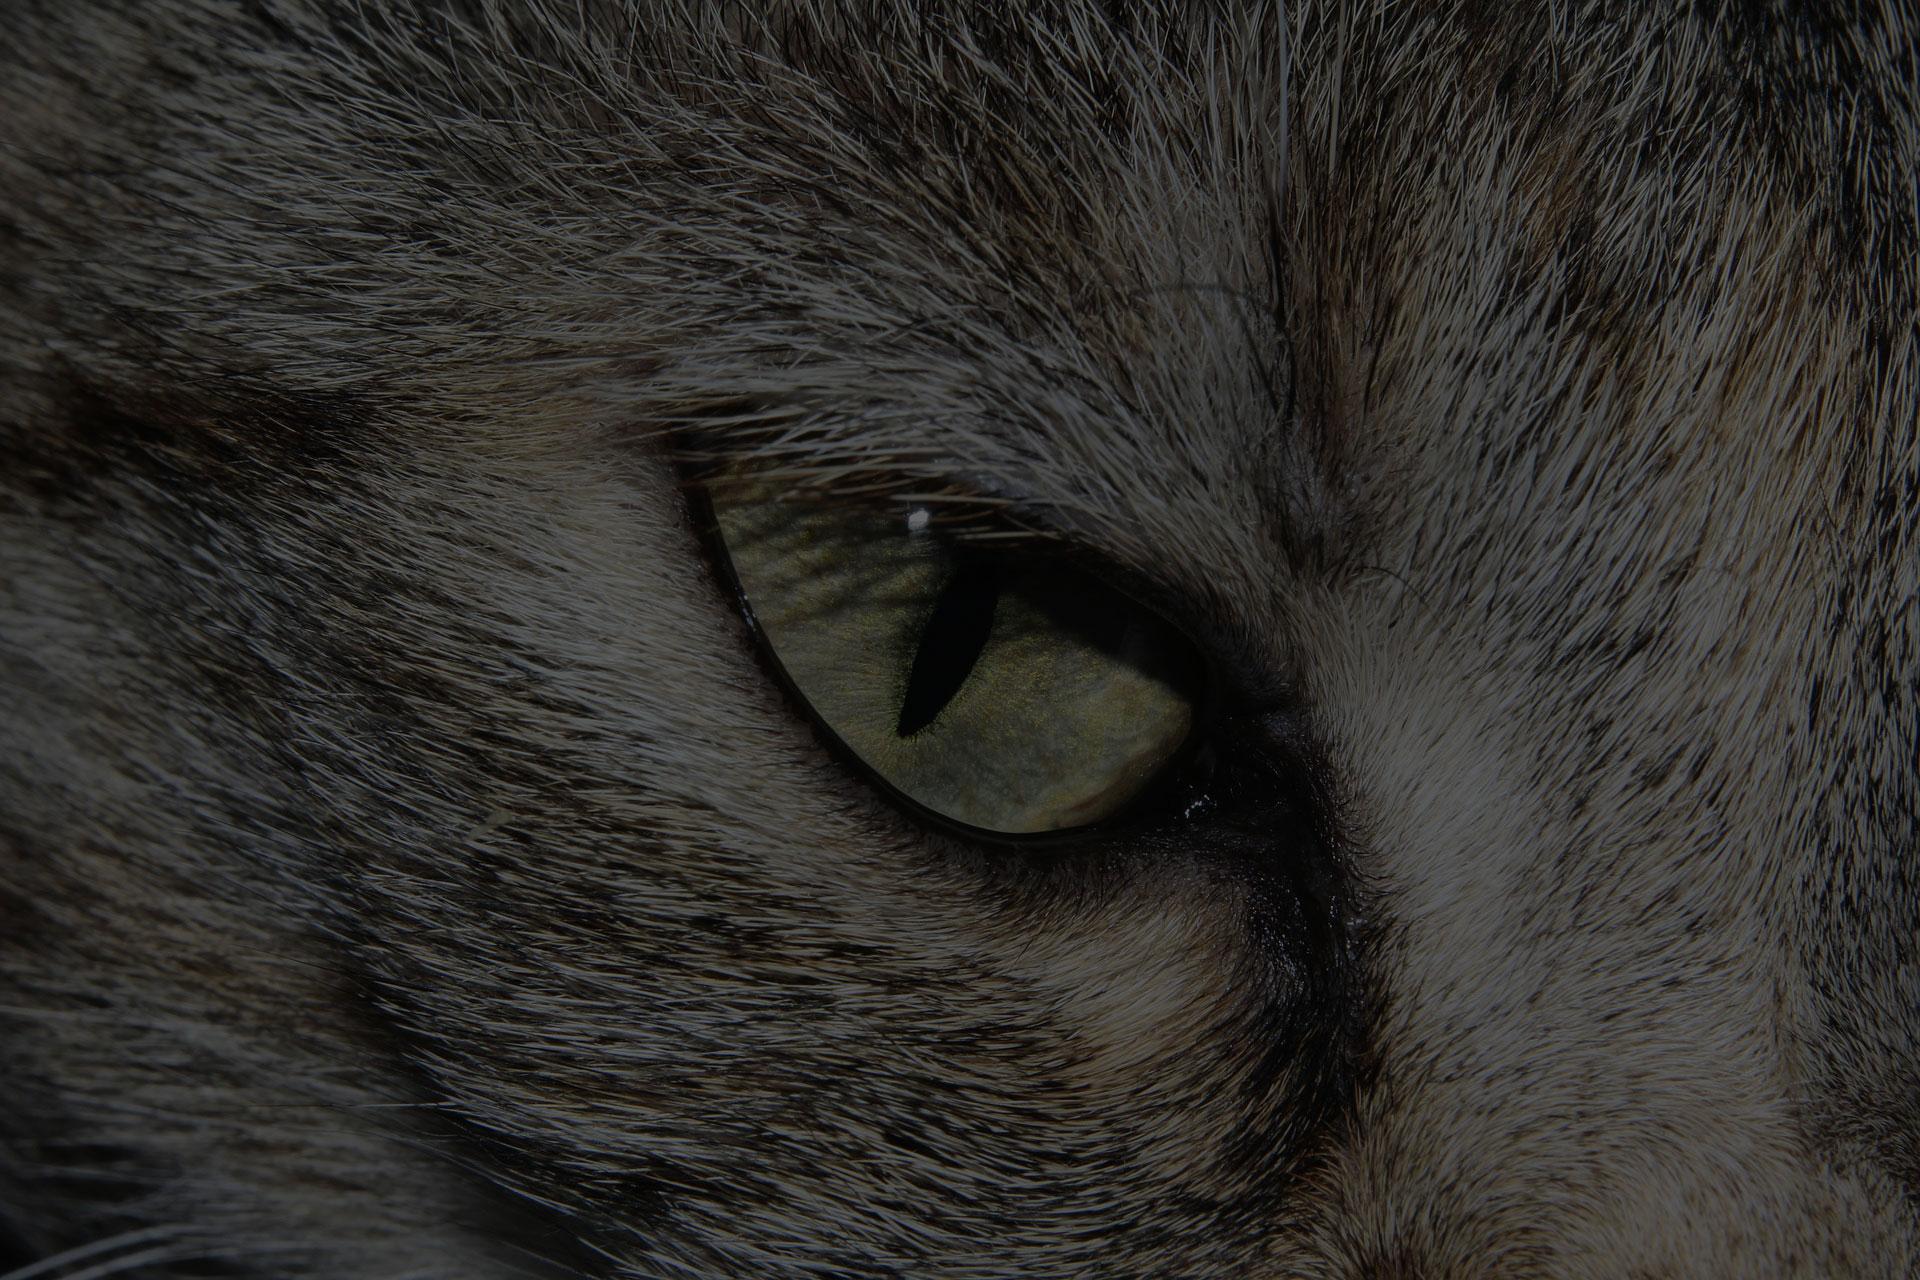 closeup photo of cat eye